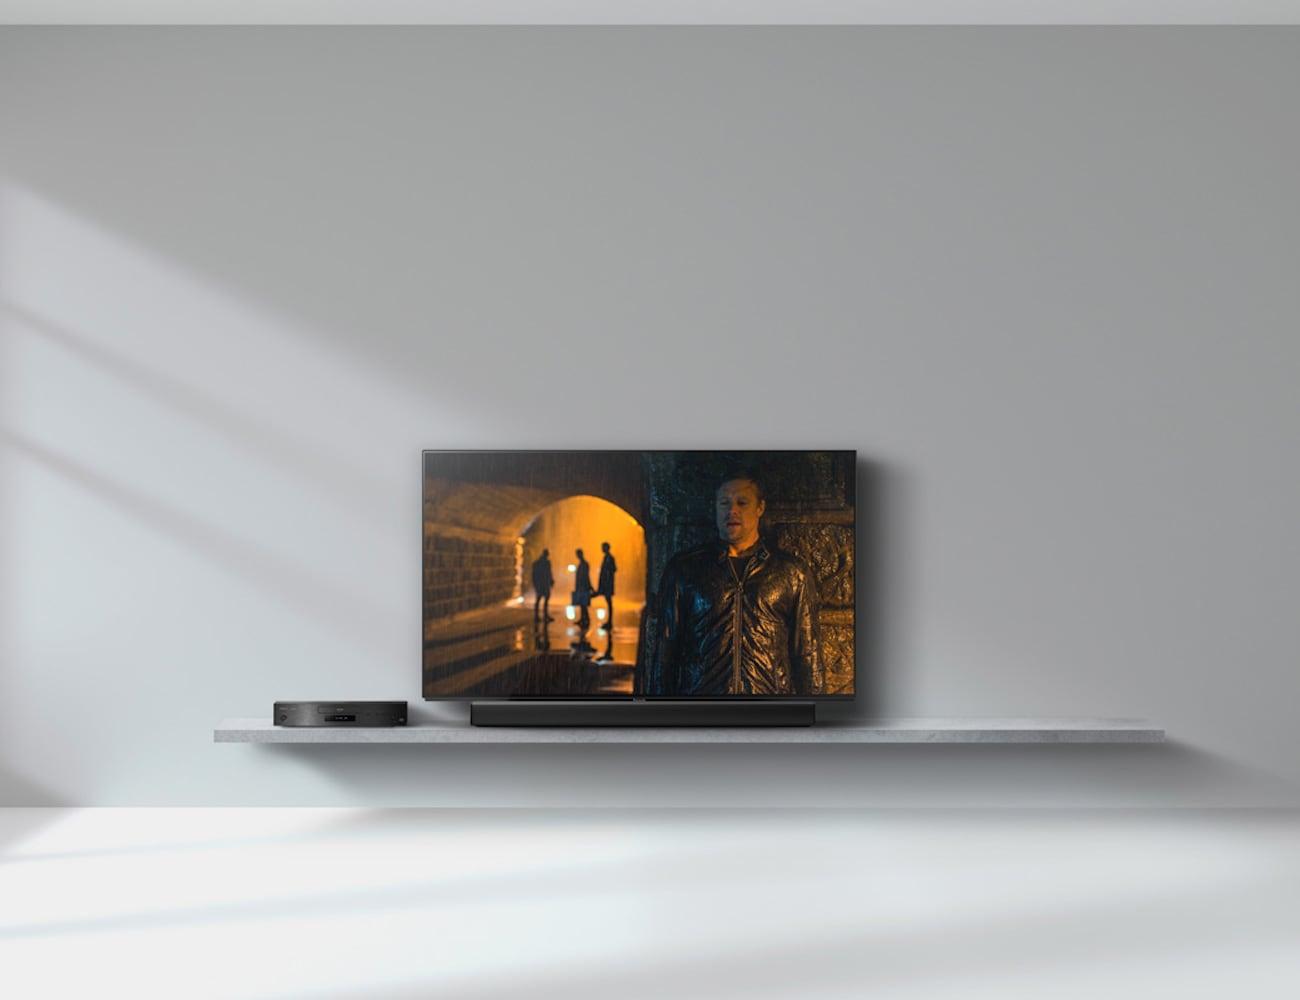 Panasonic Dolby Atmos Soundbars